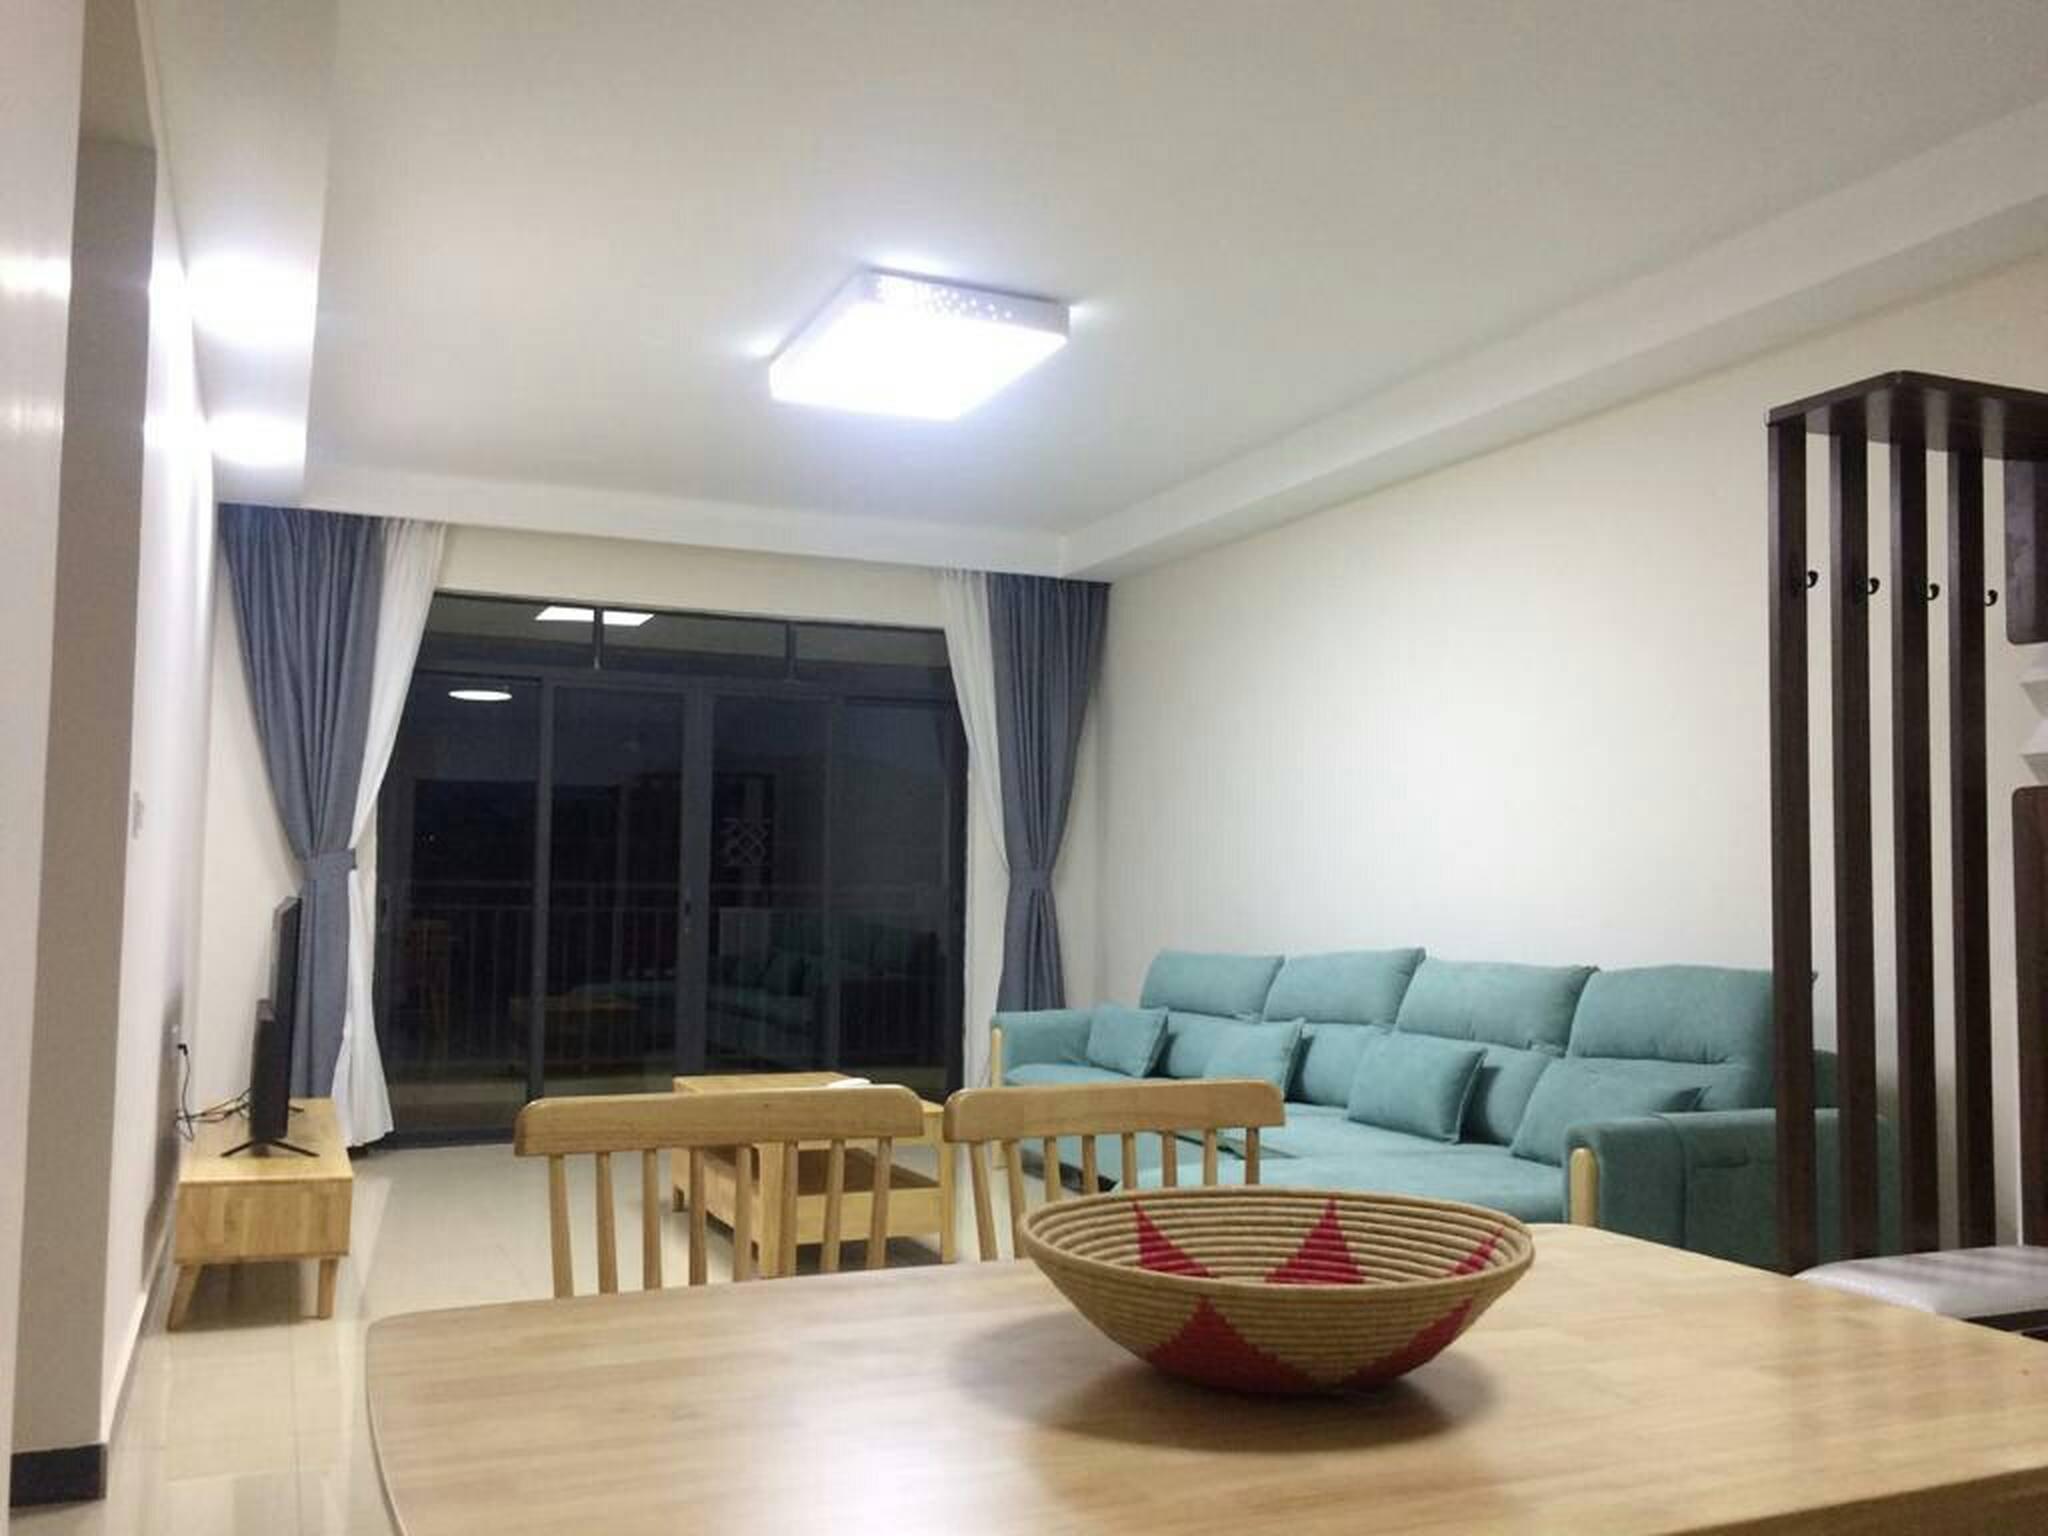 Superlative 3 Bedroom Apartment , Kigali Myplace